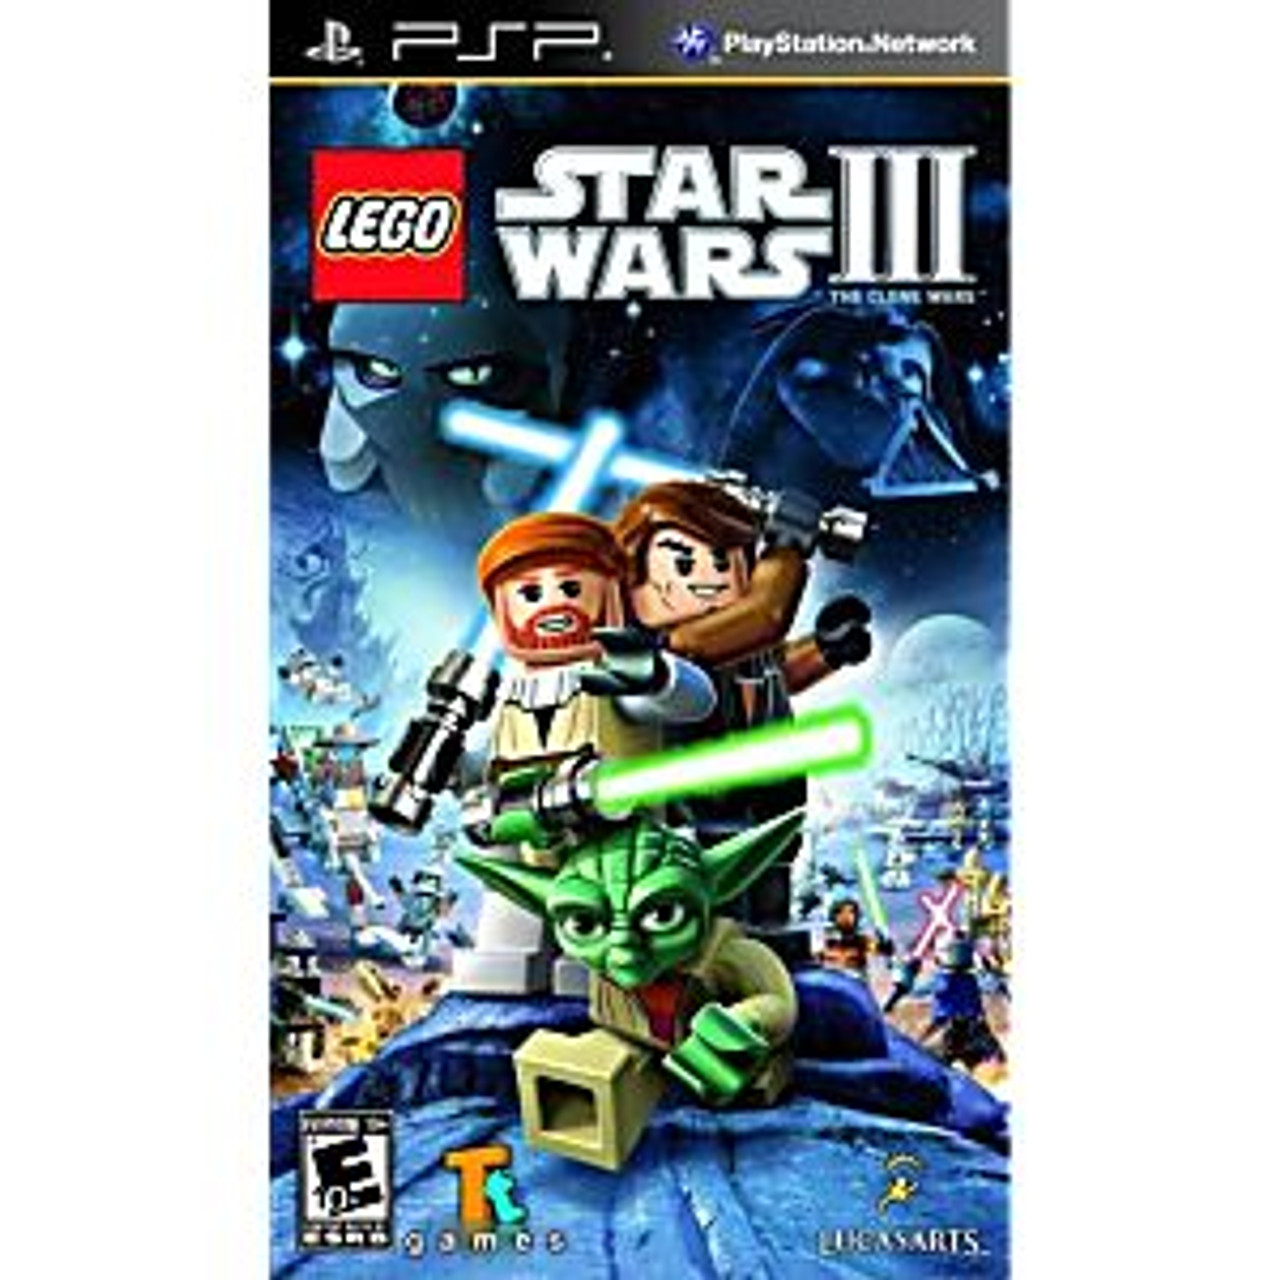 LEGO STAR WARS 3 THE CLONE WARS [E10] - PSP